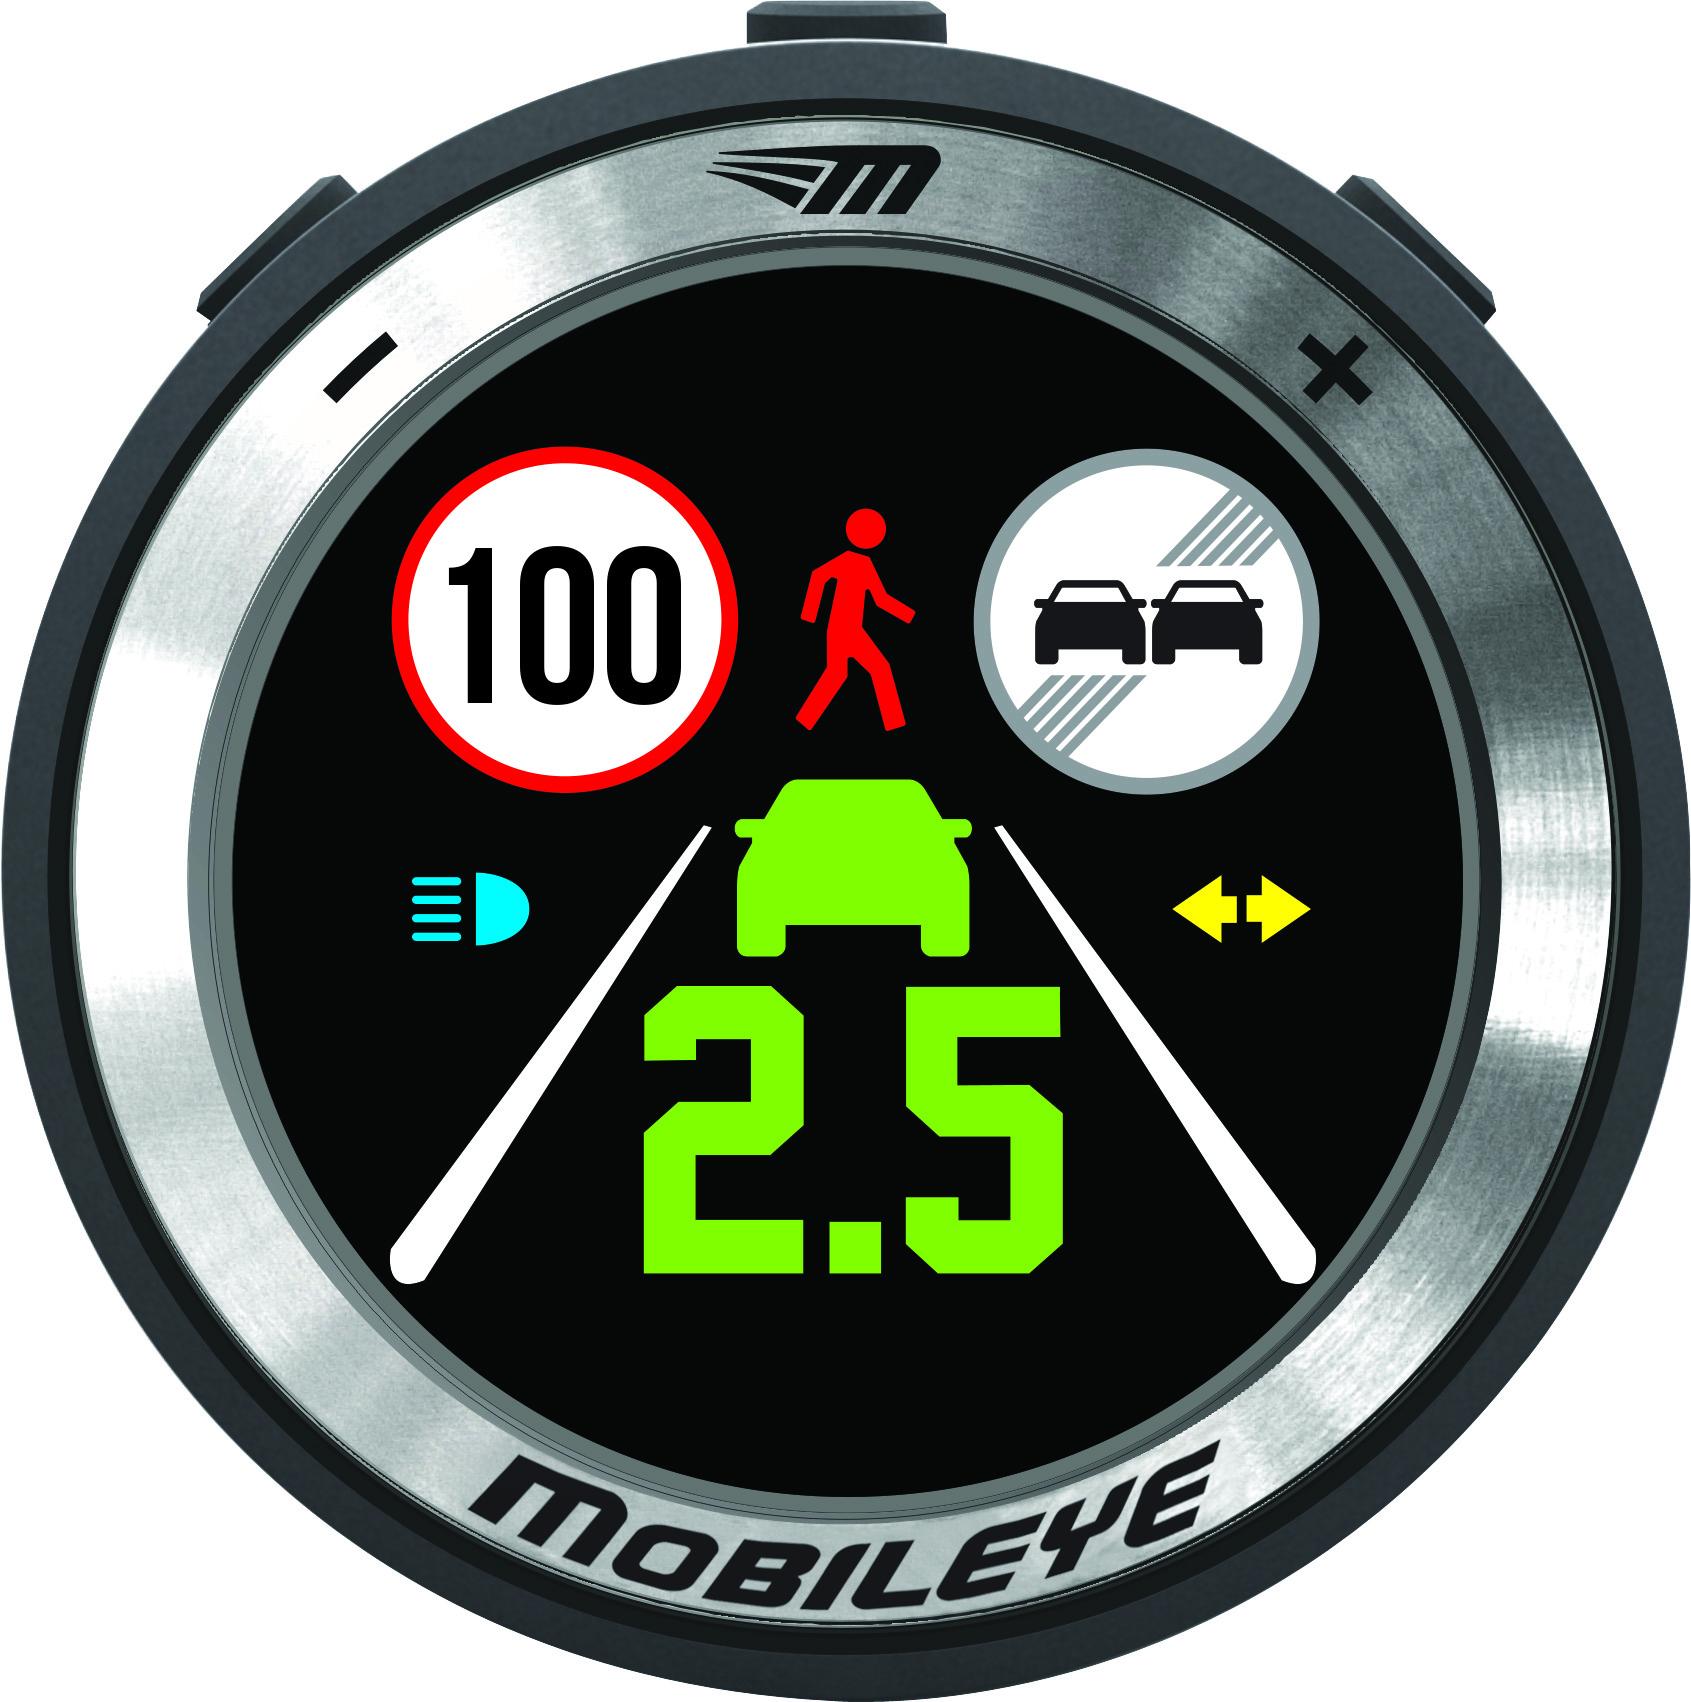 Mobileye 630 LCD-Display, alle Alarmmeldungen